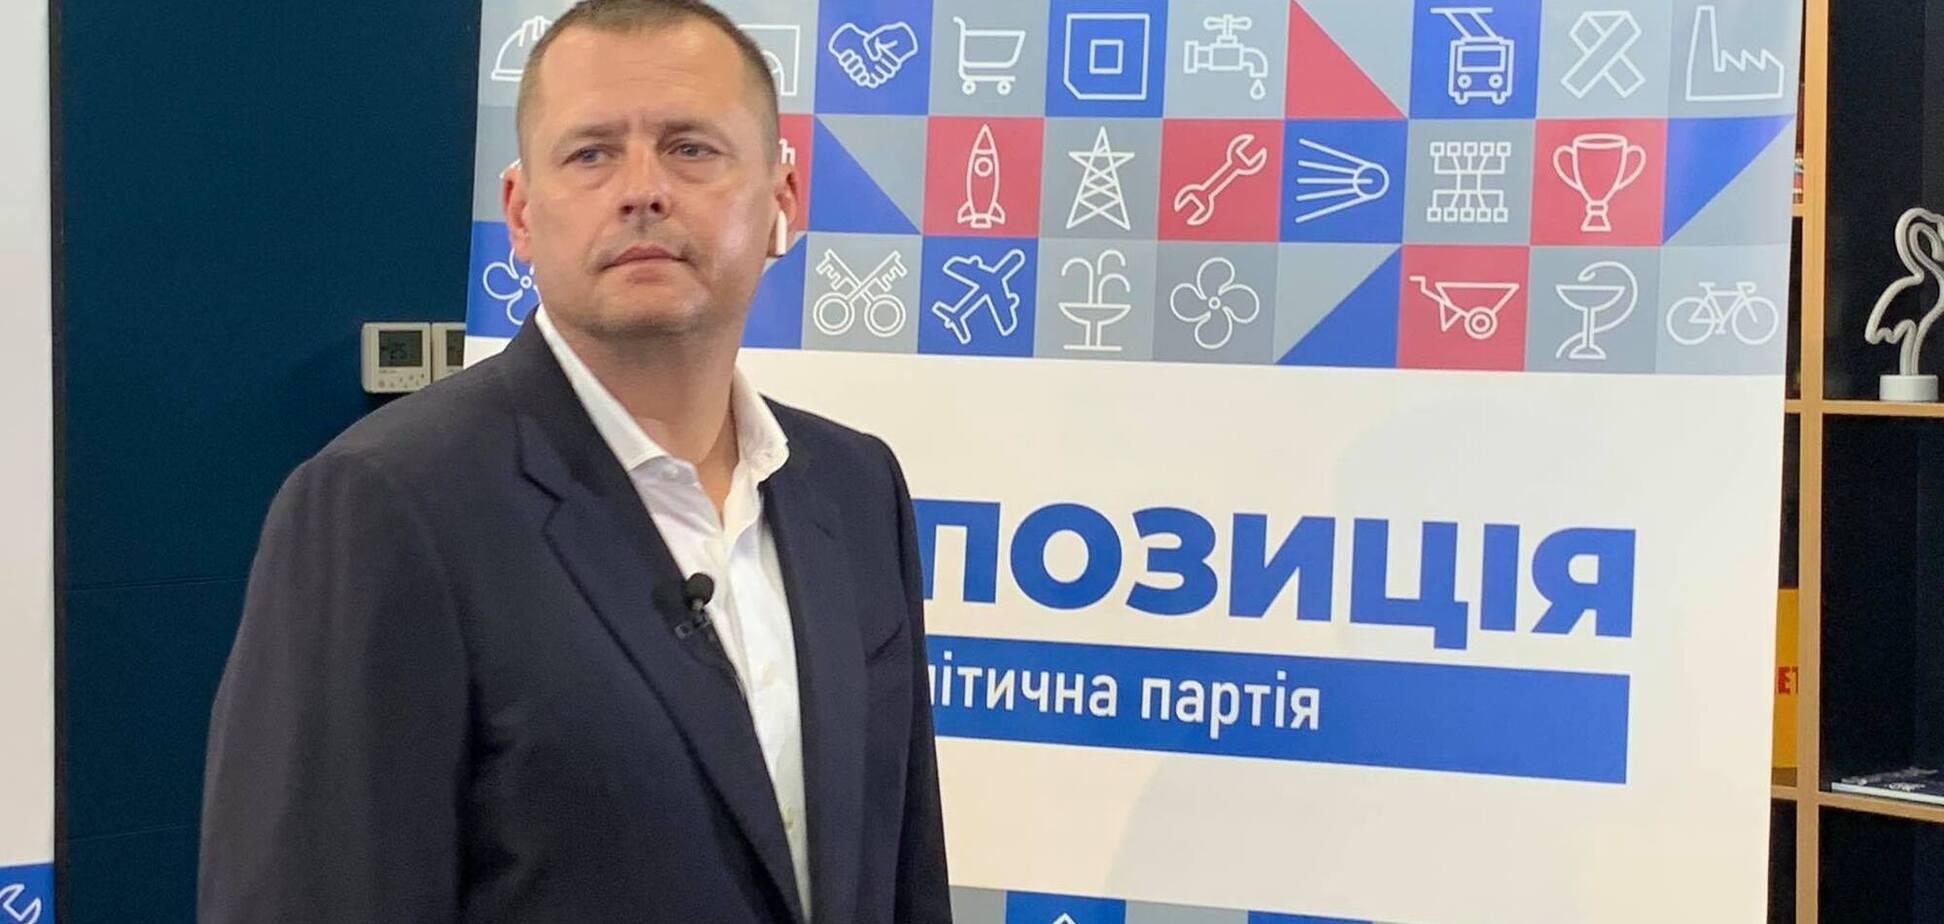 'Пропозиція' победила на выборах в горсовет Днепра - 'Опора'